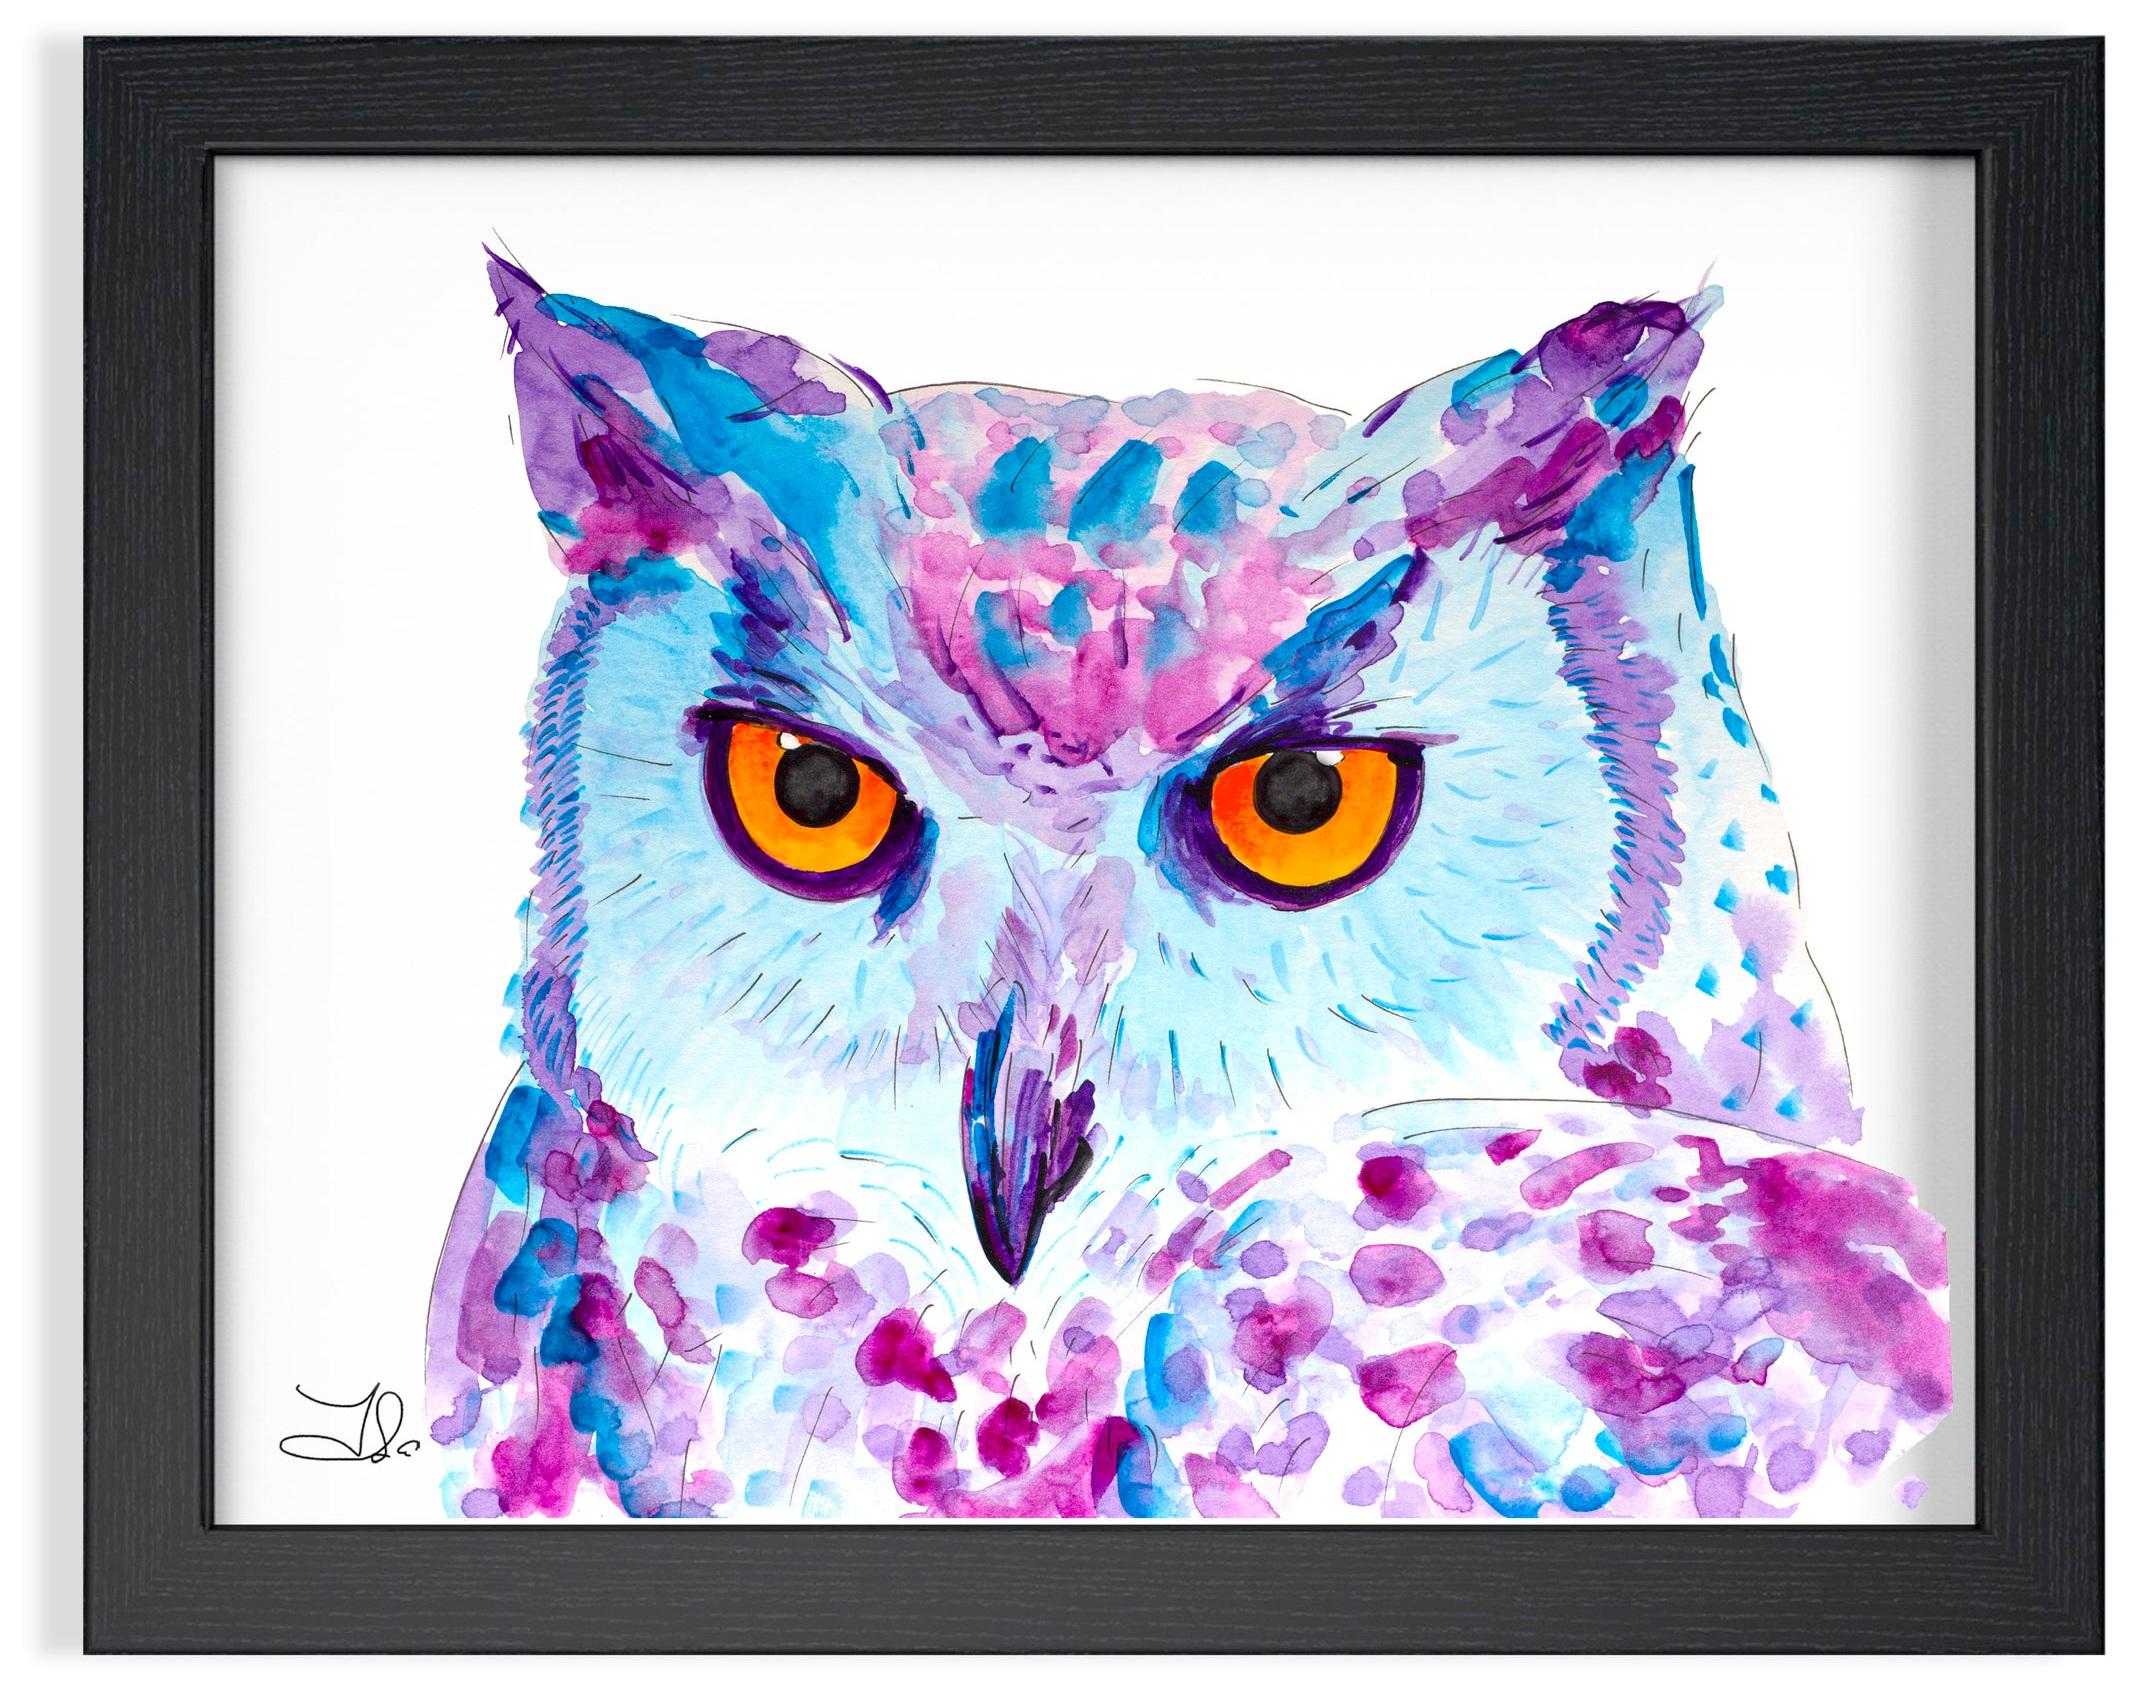 "Snowy Owl Watercolor  89. 00 $CA Strathmore Vision 300 gsm  Original watercolor painting 9 x 10 1/2"" (23 x 27 cm)"